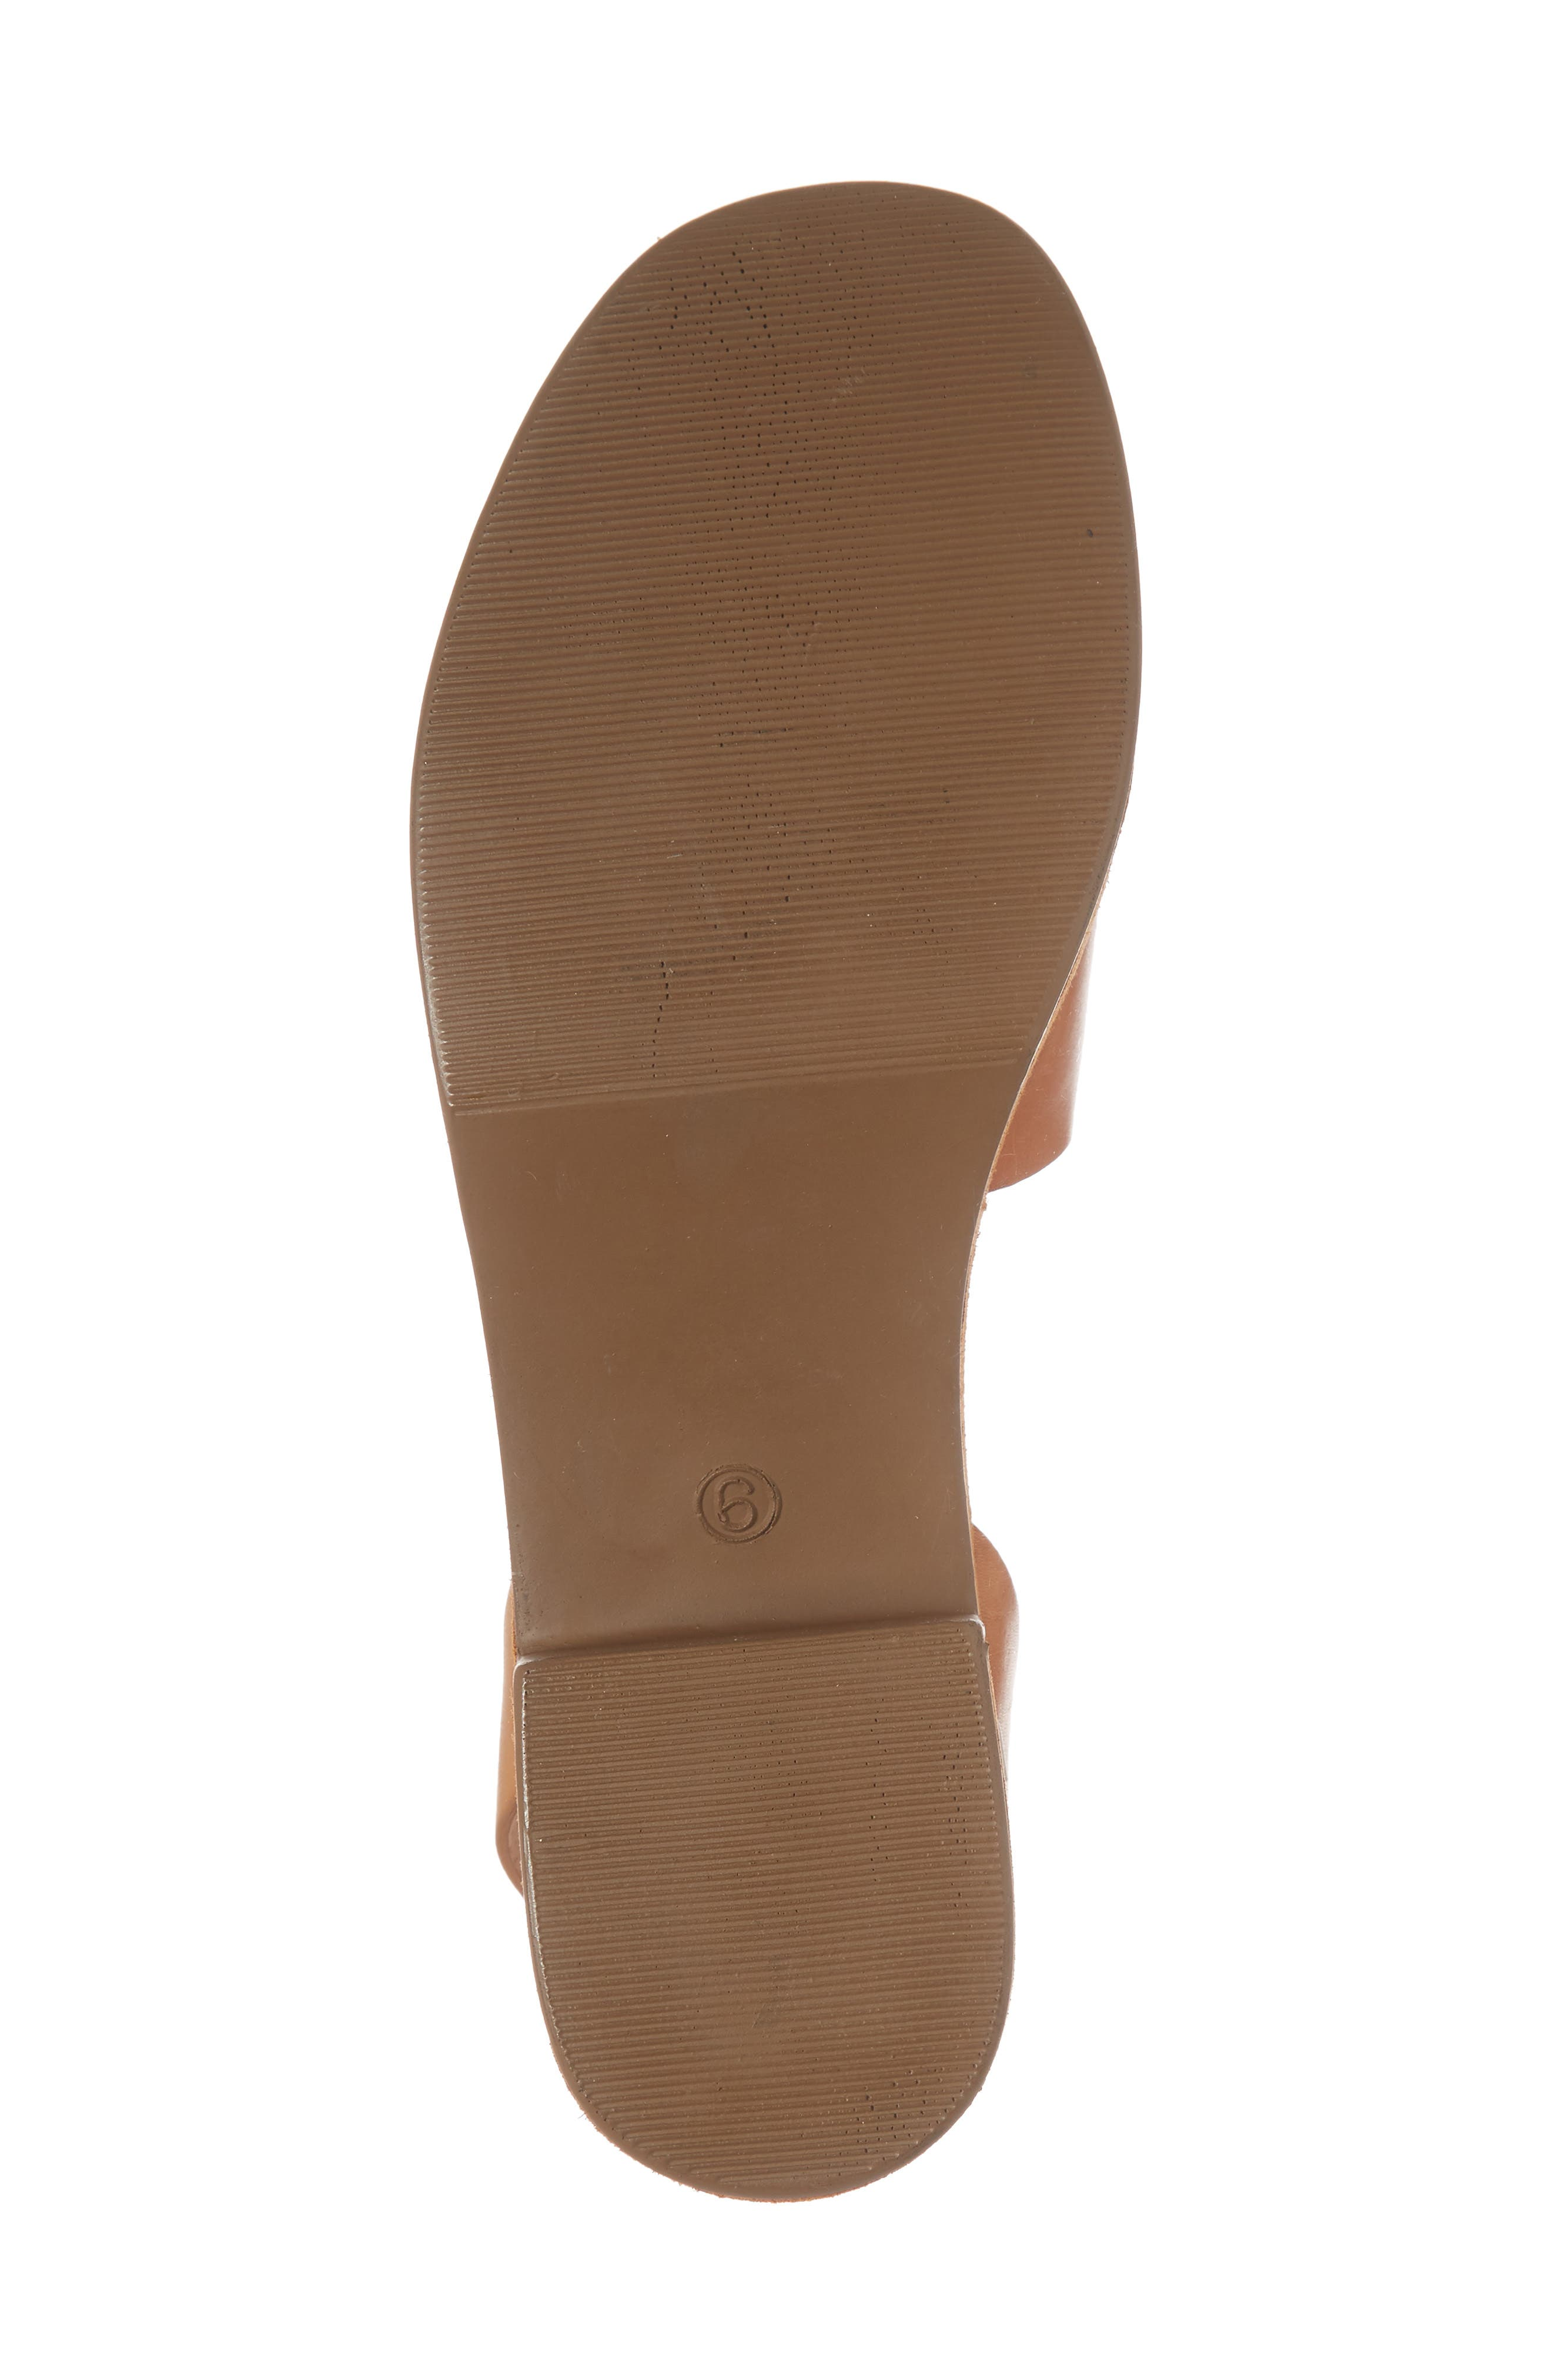 Calming Influence Platform Sandal,                             Alternate thumbnail 6, color,                             Tan Leather